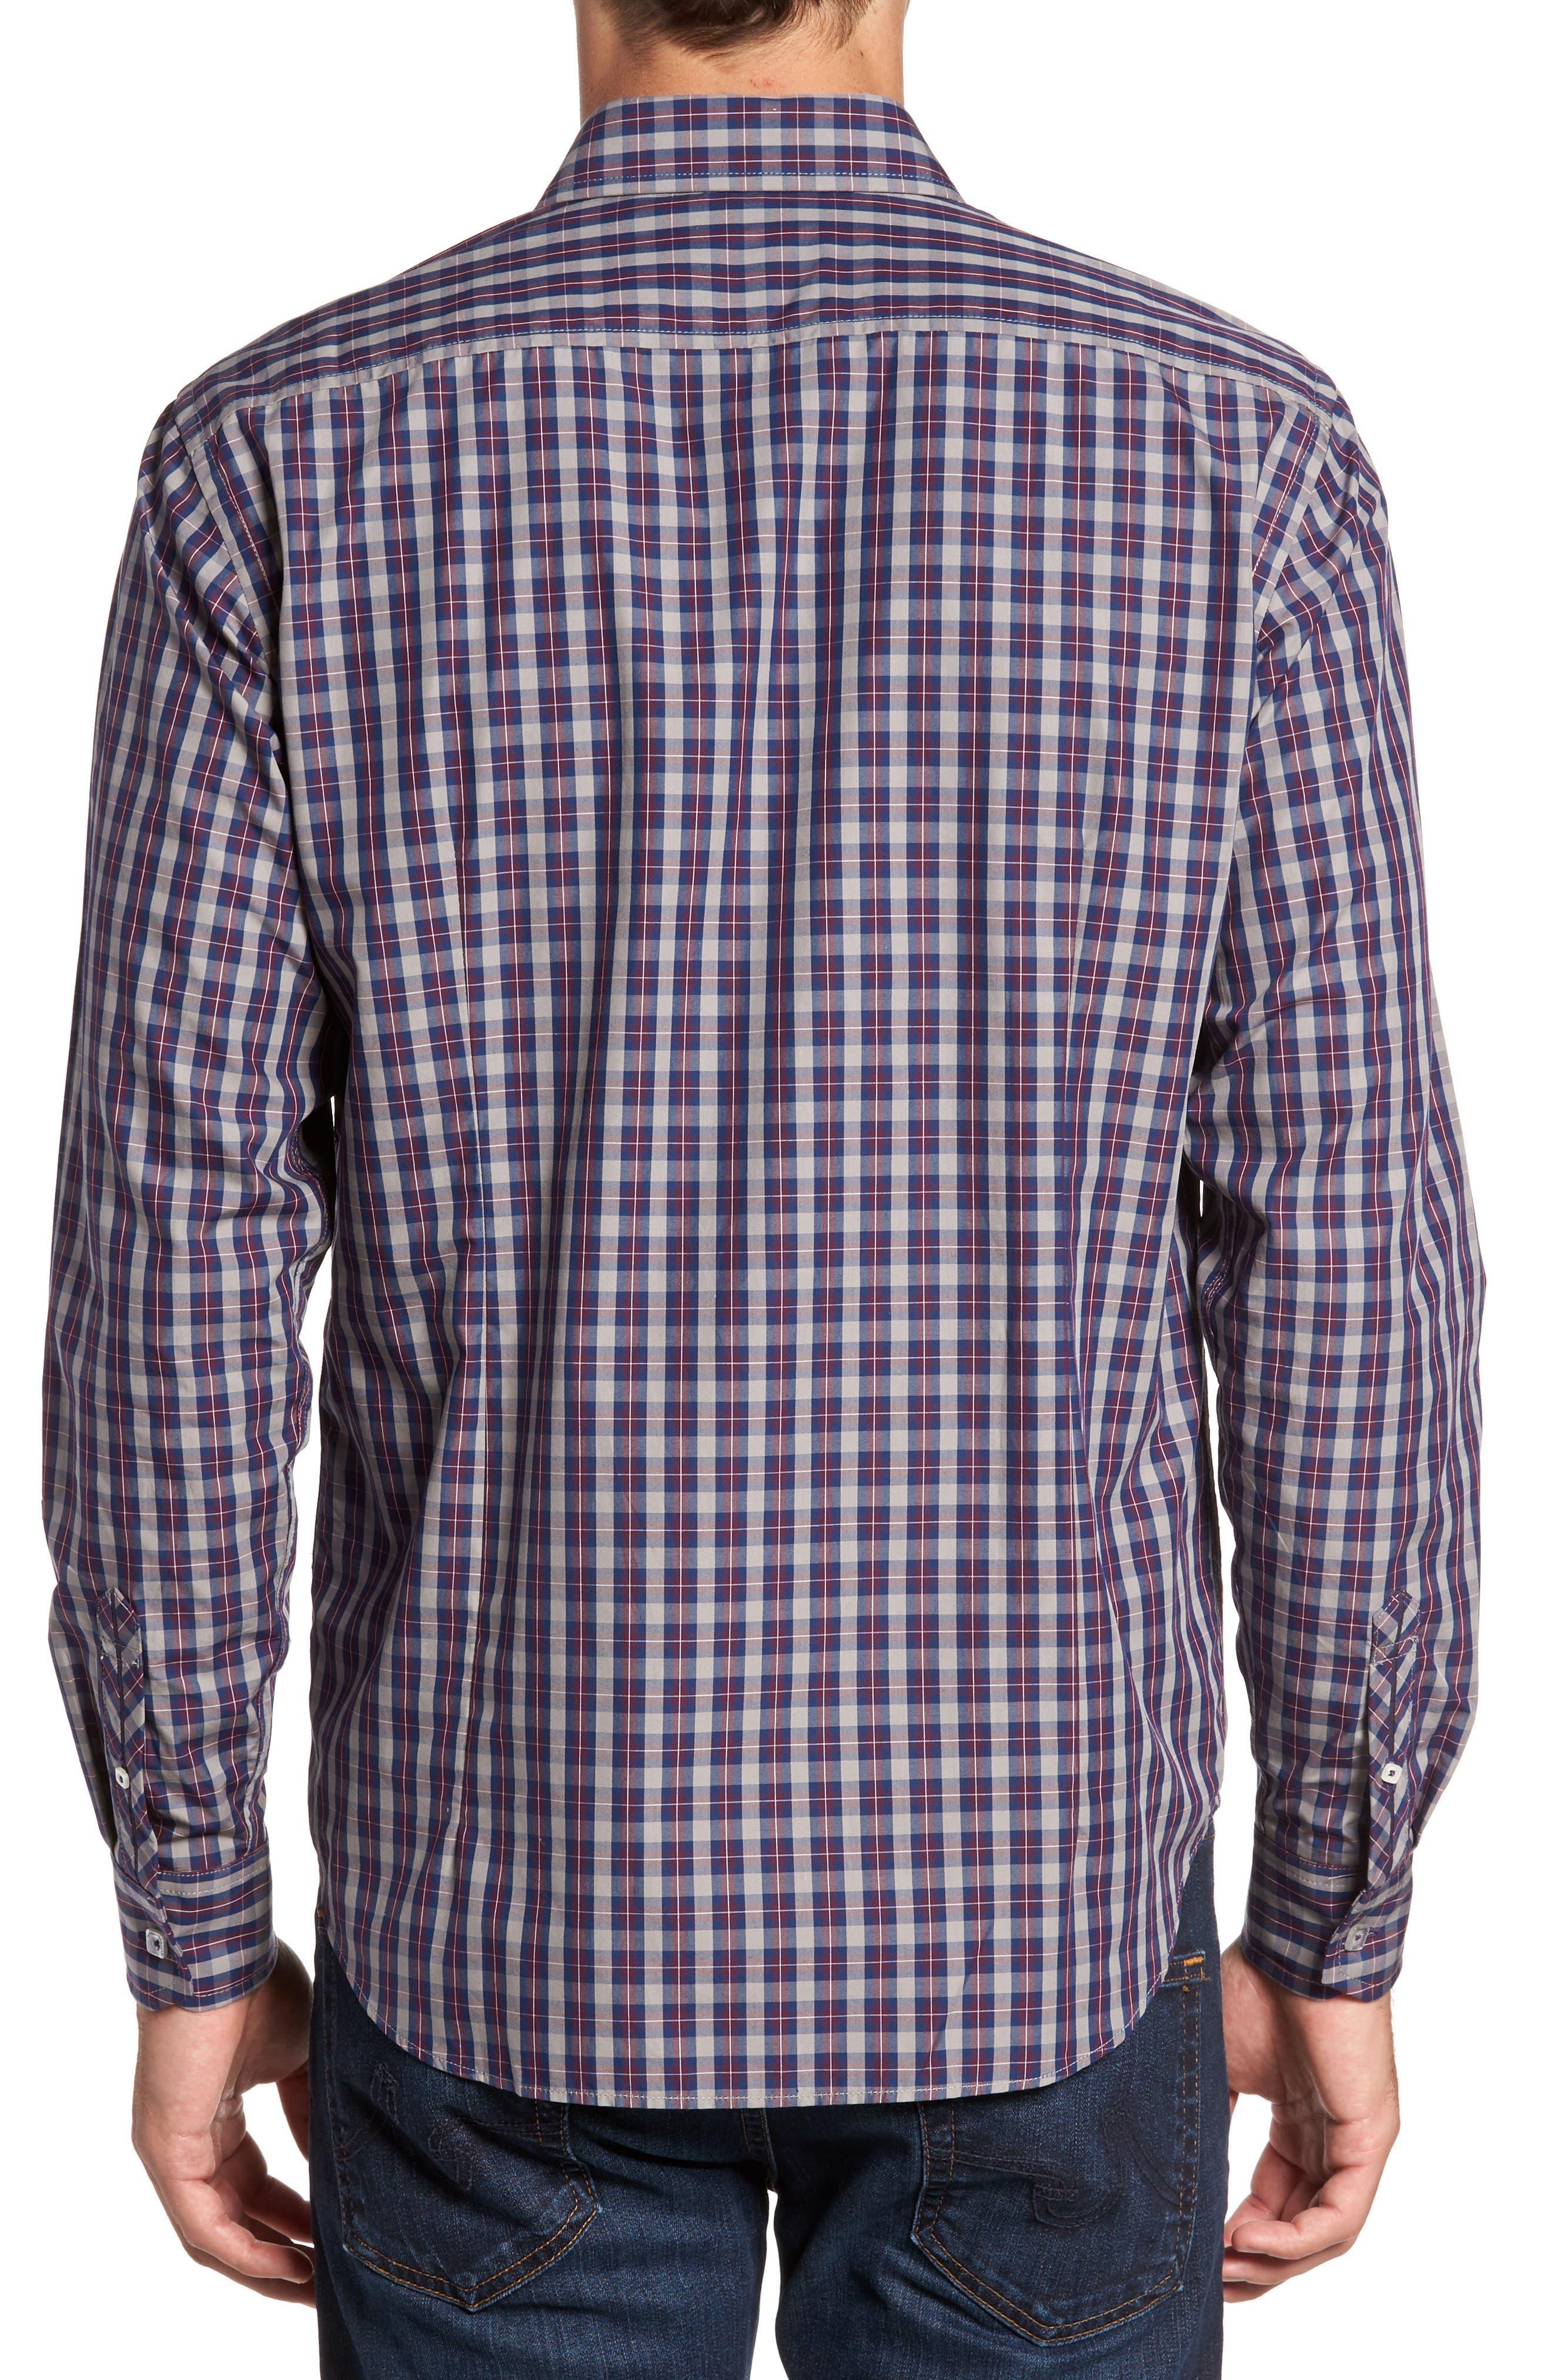 Regular Fit Plaid Sport Shirt,                             Alternate thumbnail 2, color,                             930